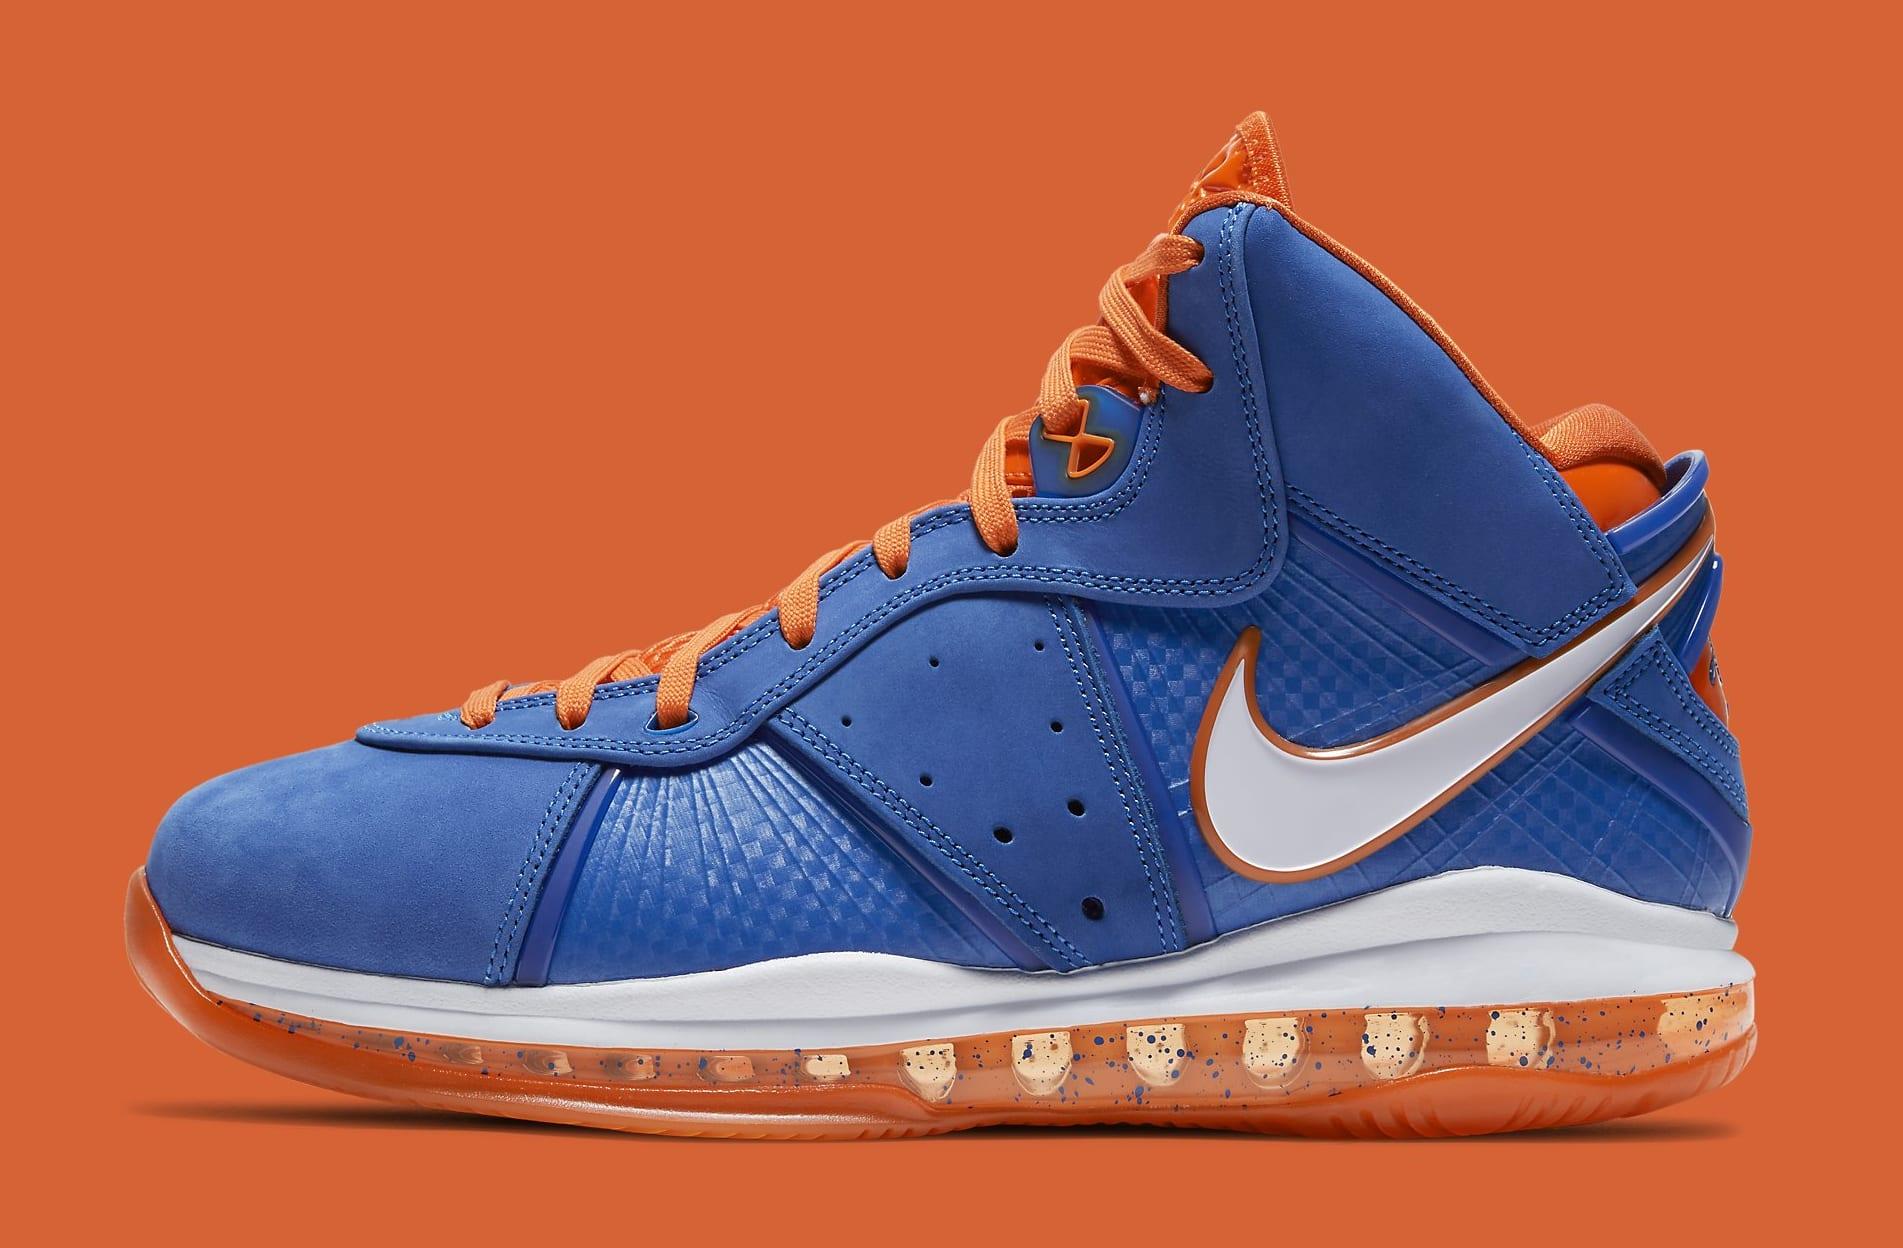 Nike LeBron 8 'HWC' CV1750-400 Lateral